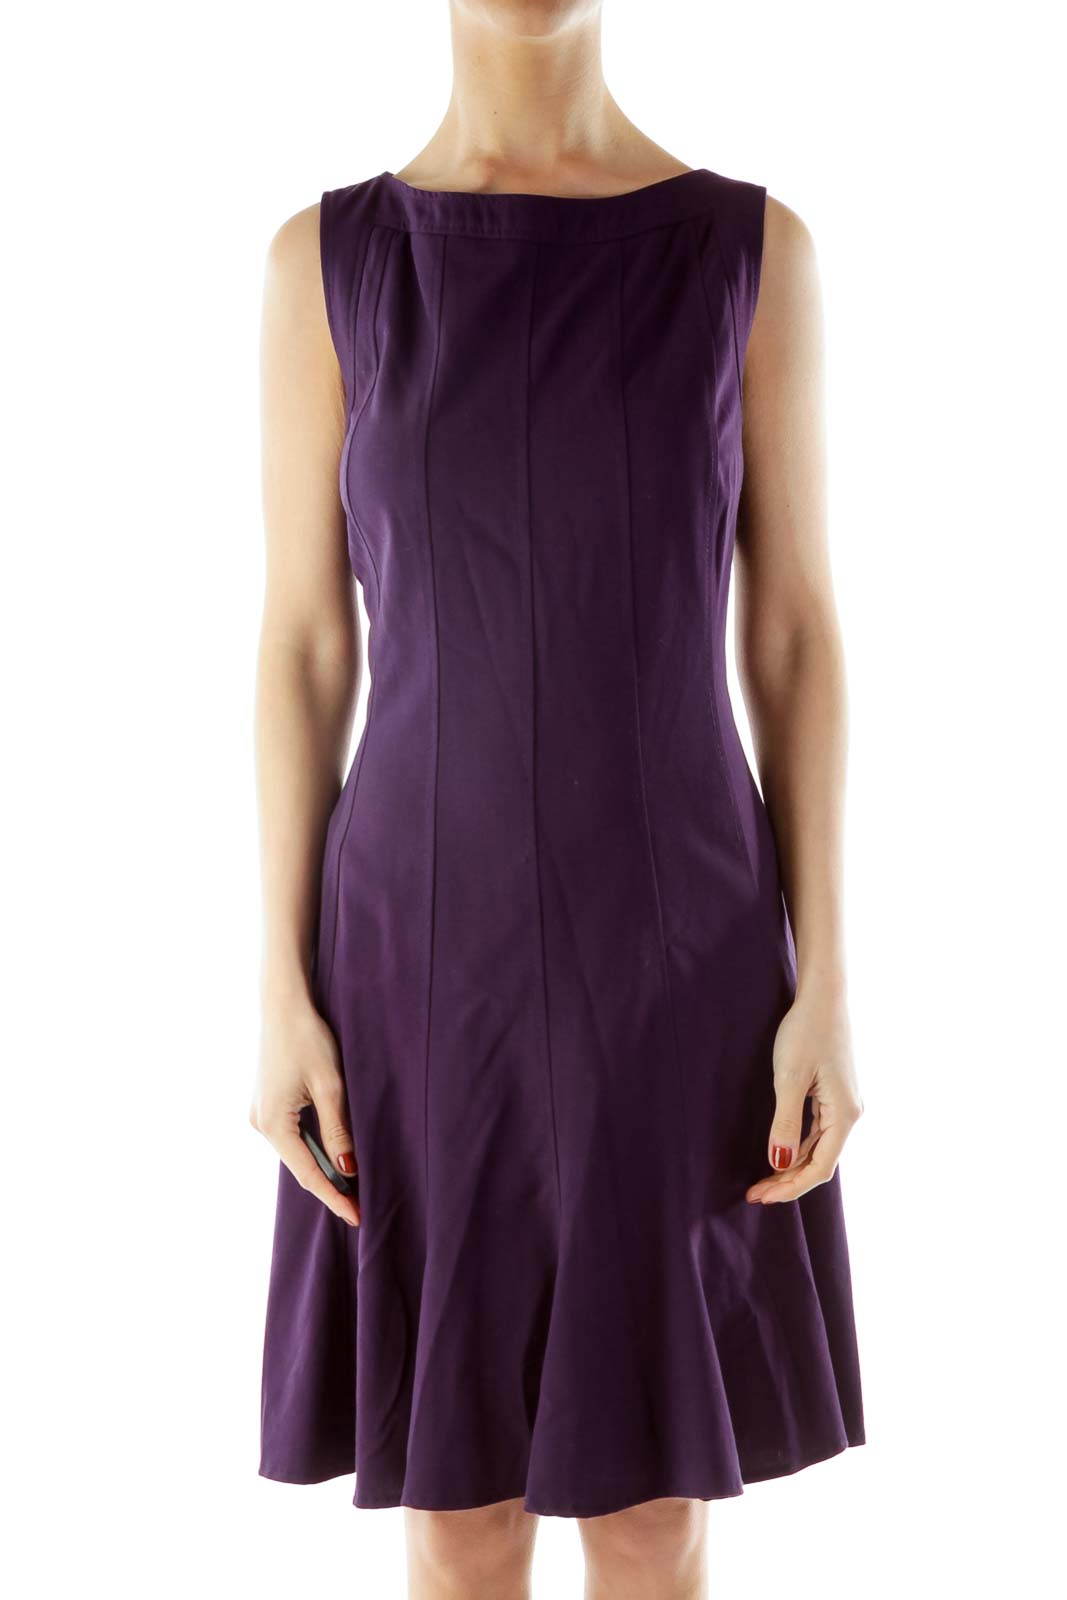 Purple Sleeveless Work Dress Front